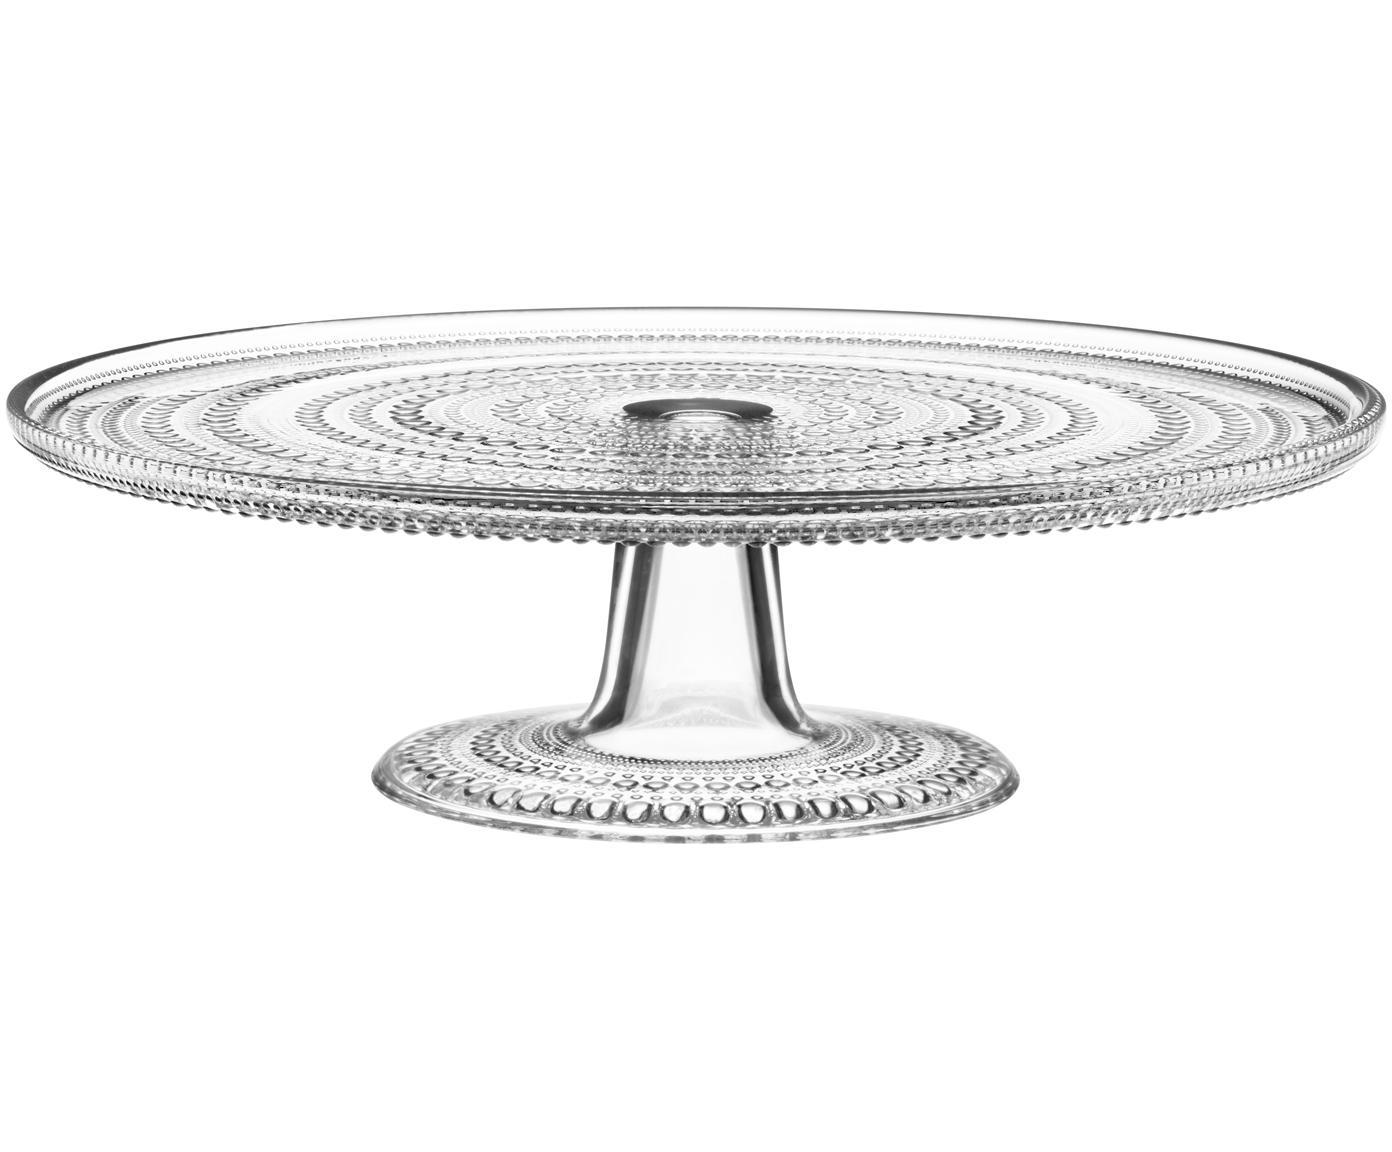 Tortenplatte Kastehelmi, Glas, Transparent, Ø 32 cm